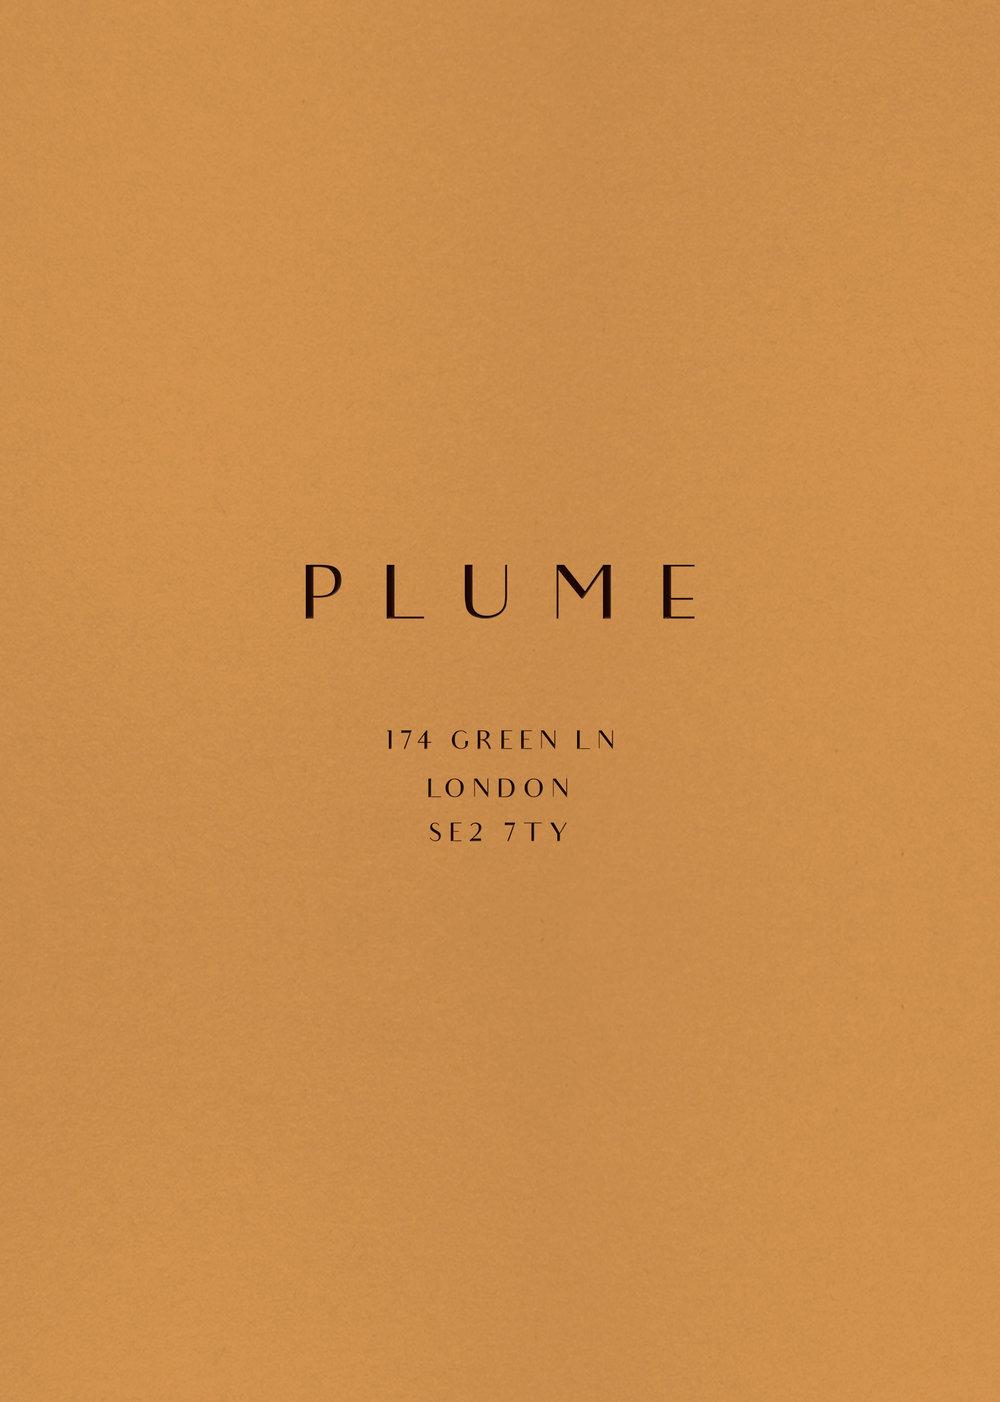 plume-fashion-logo-loolaadesigns.jpg